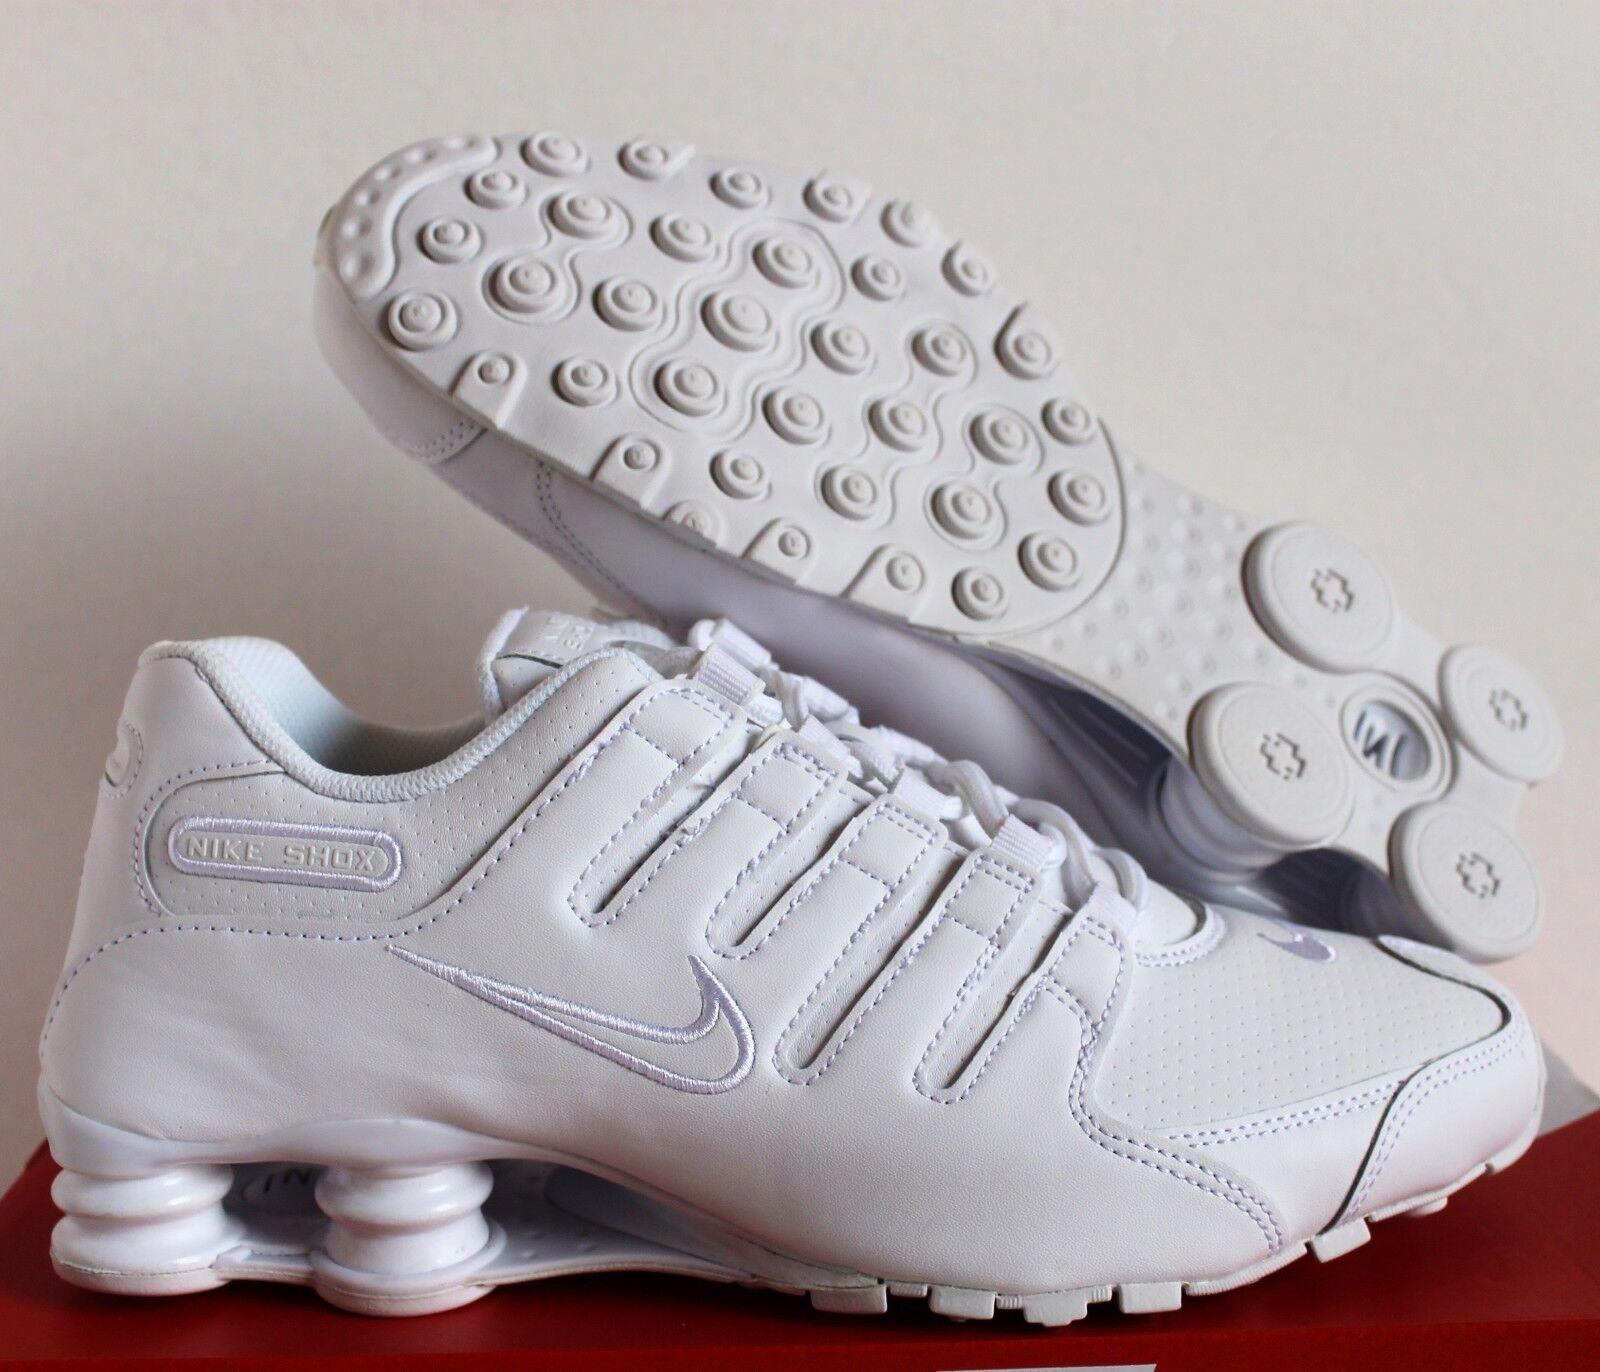 Nike [378341-128] Hombres Shox NZ BLANCO/Blanco [378341-128] Nike a64bde